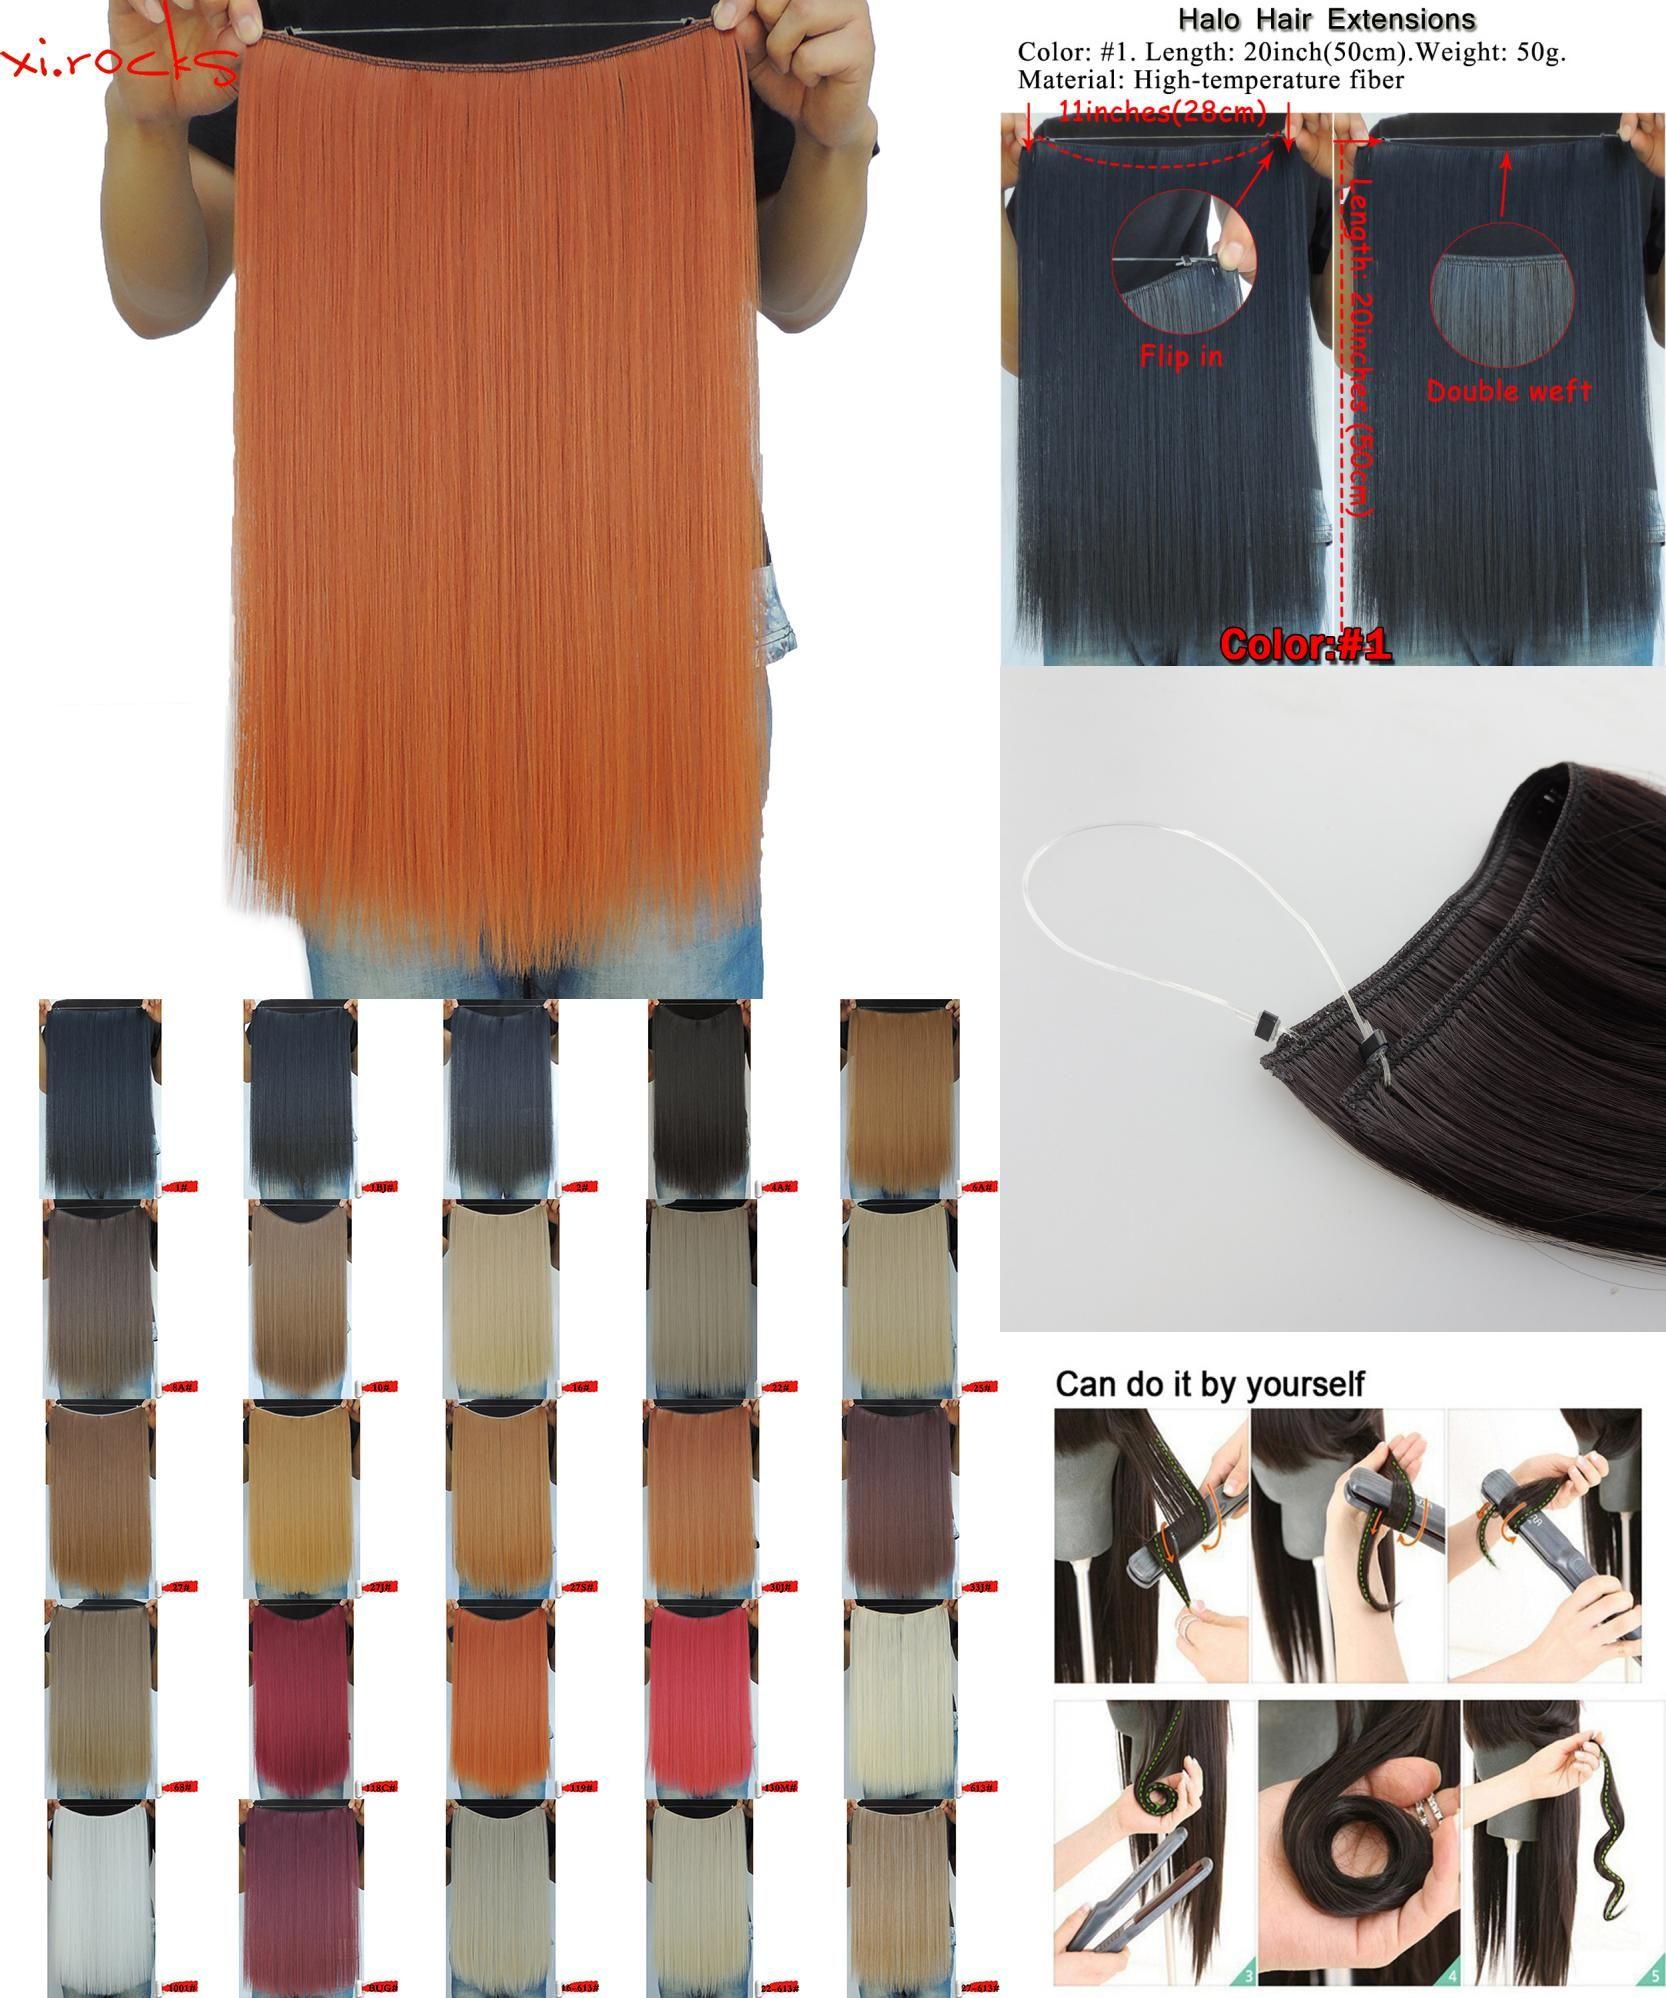 Visit To Buy Xicks 25 Colors 50g 20inch Halo Elastic Rope Hair